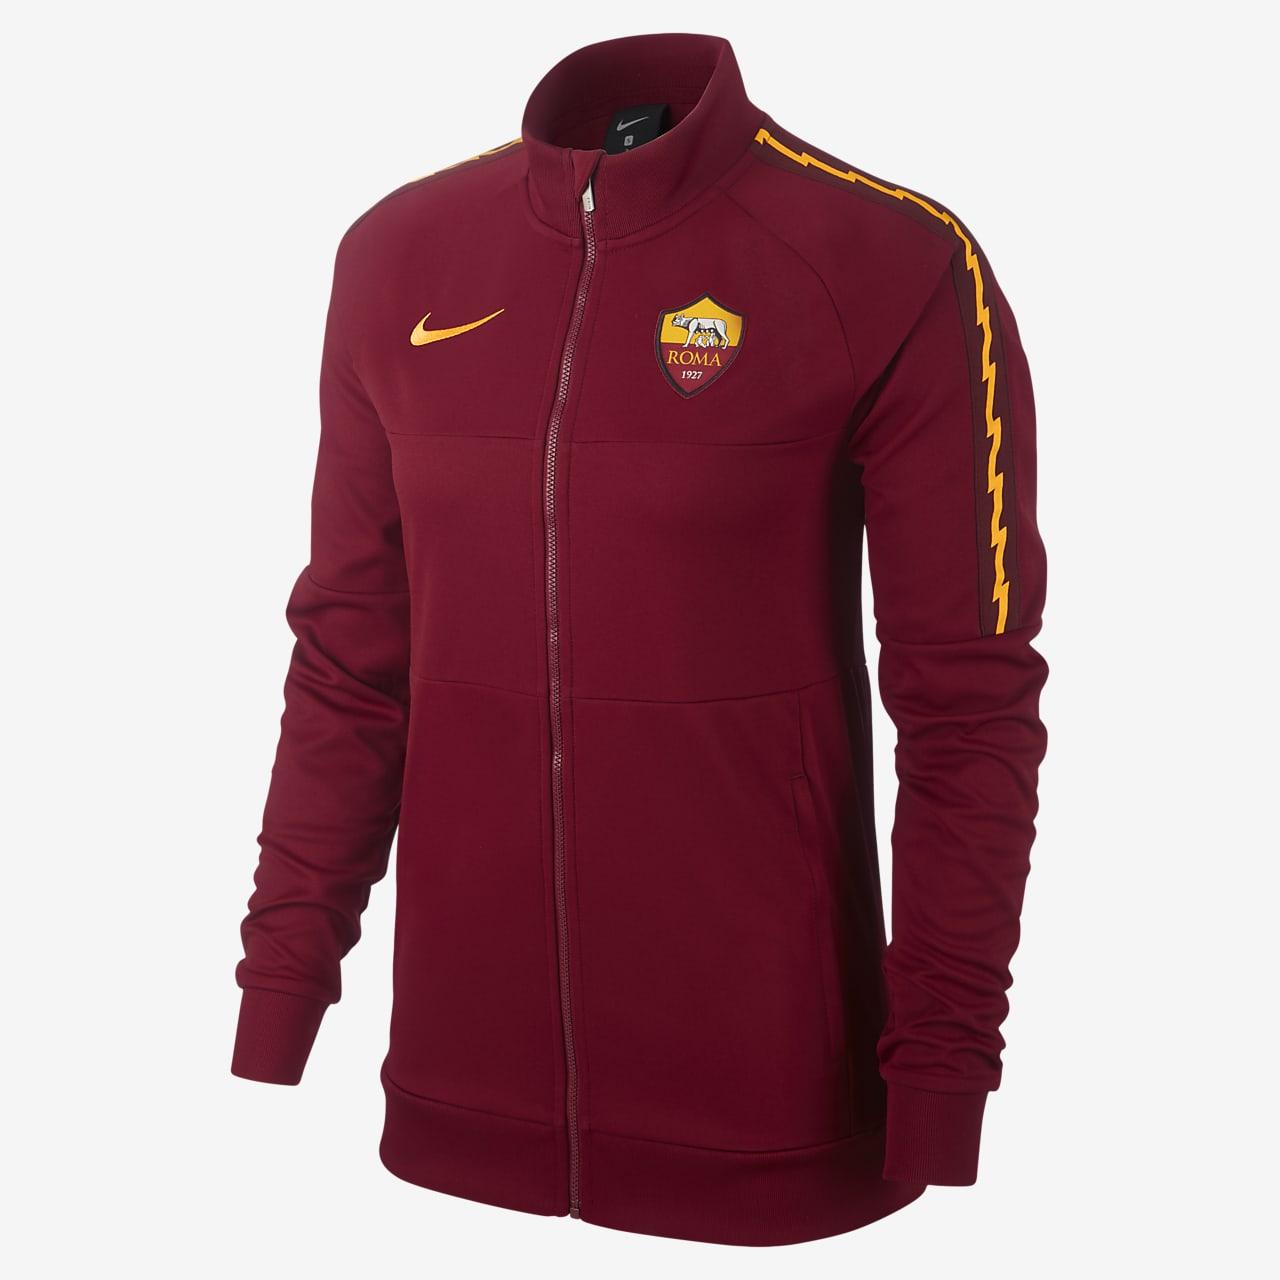 A.S. Roma jakke til dame